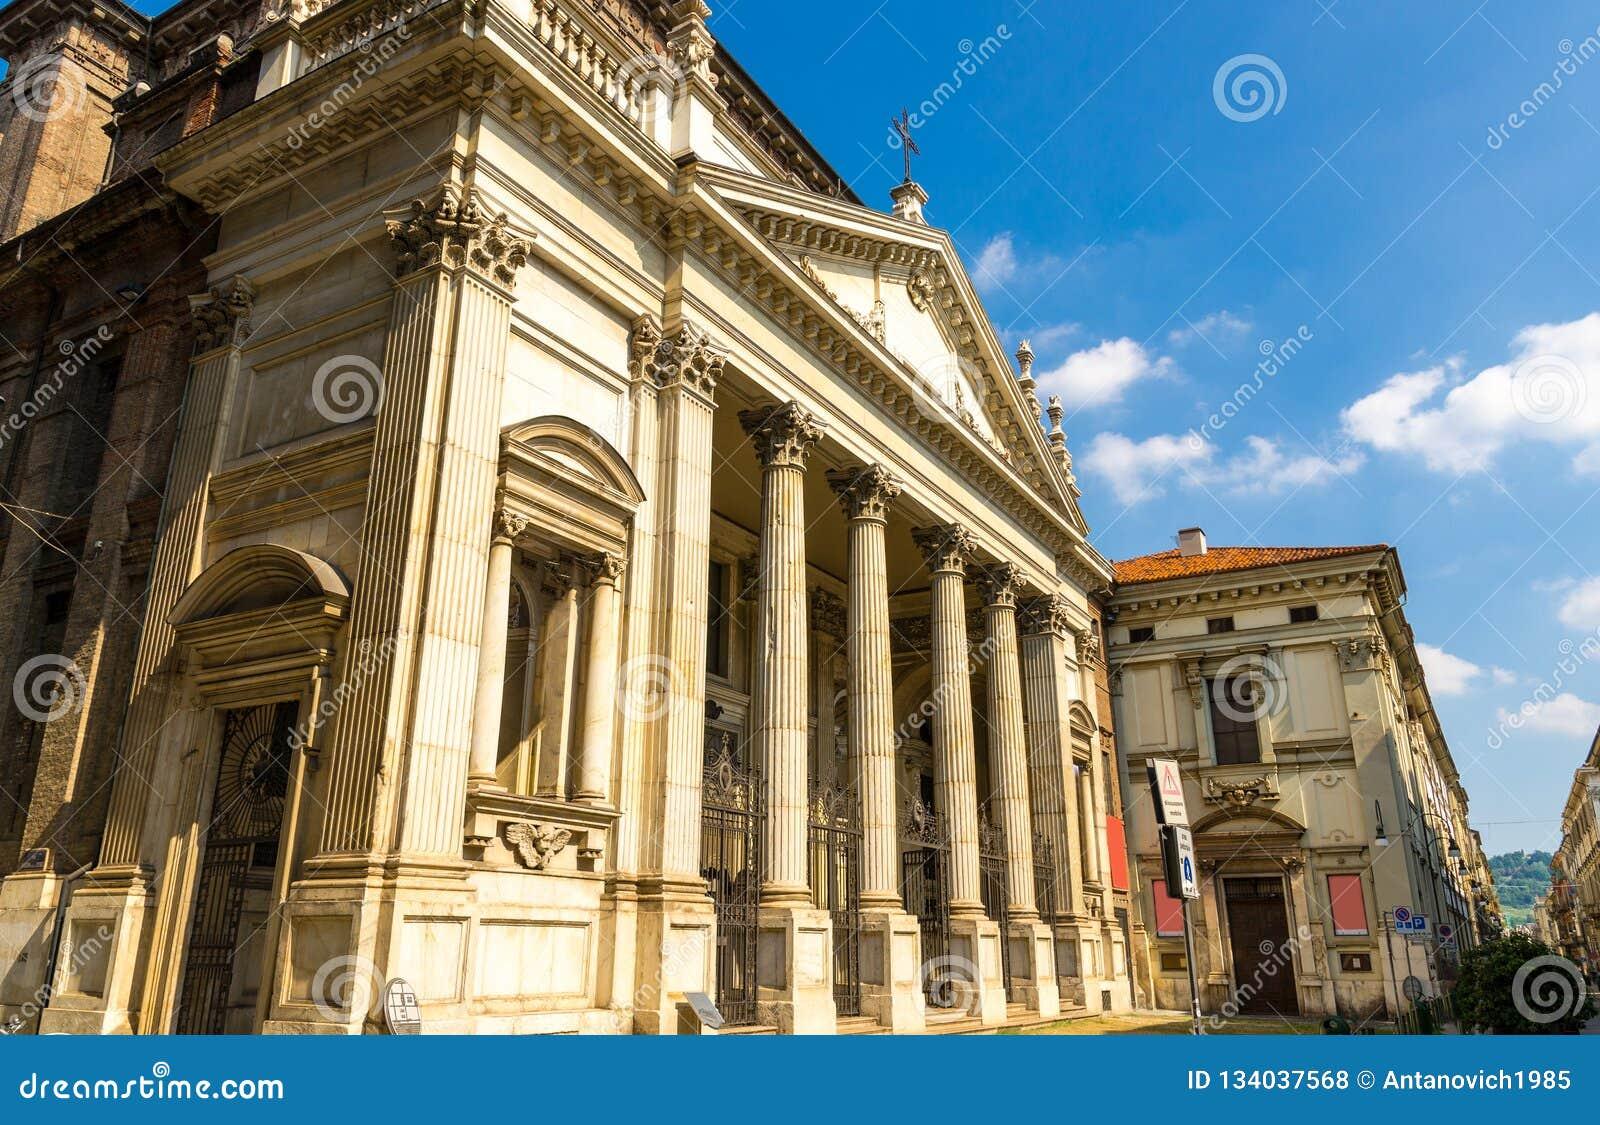 Chiesa Di SAN Filippo Neri καθολικό κτήριο ύφους classicism εκκλησιών